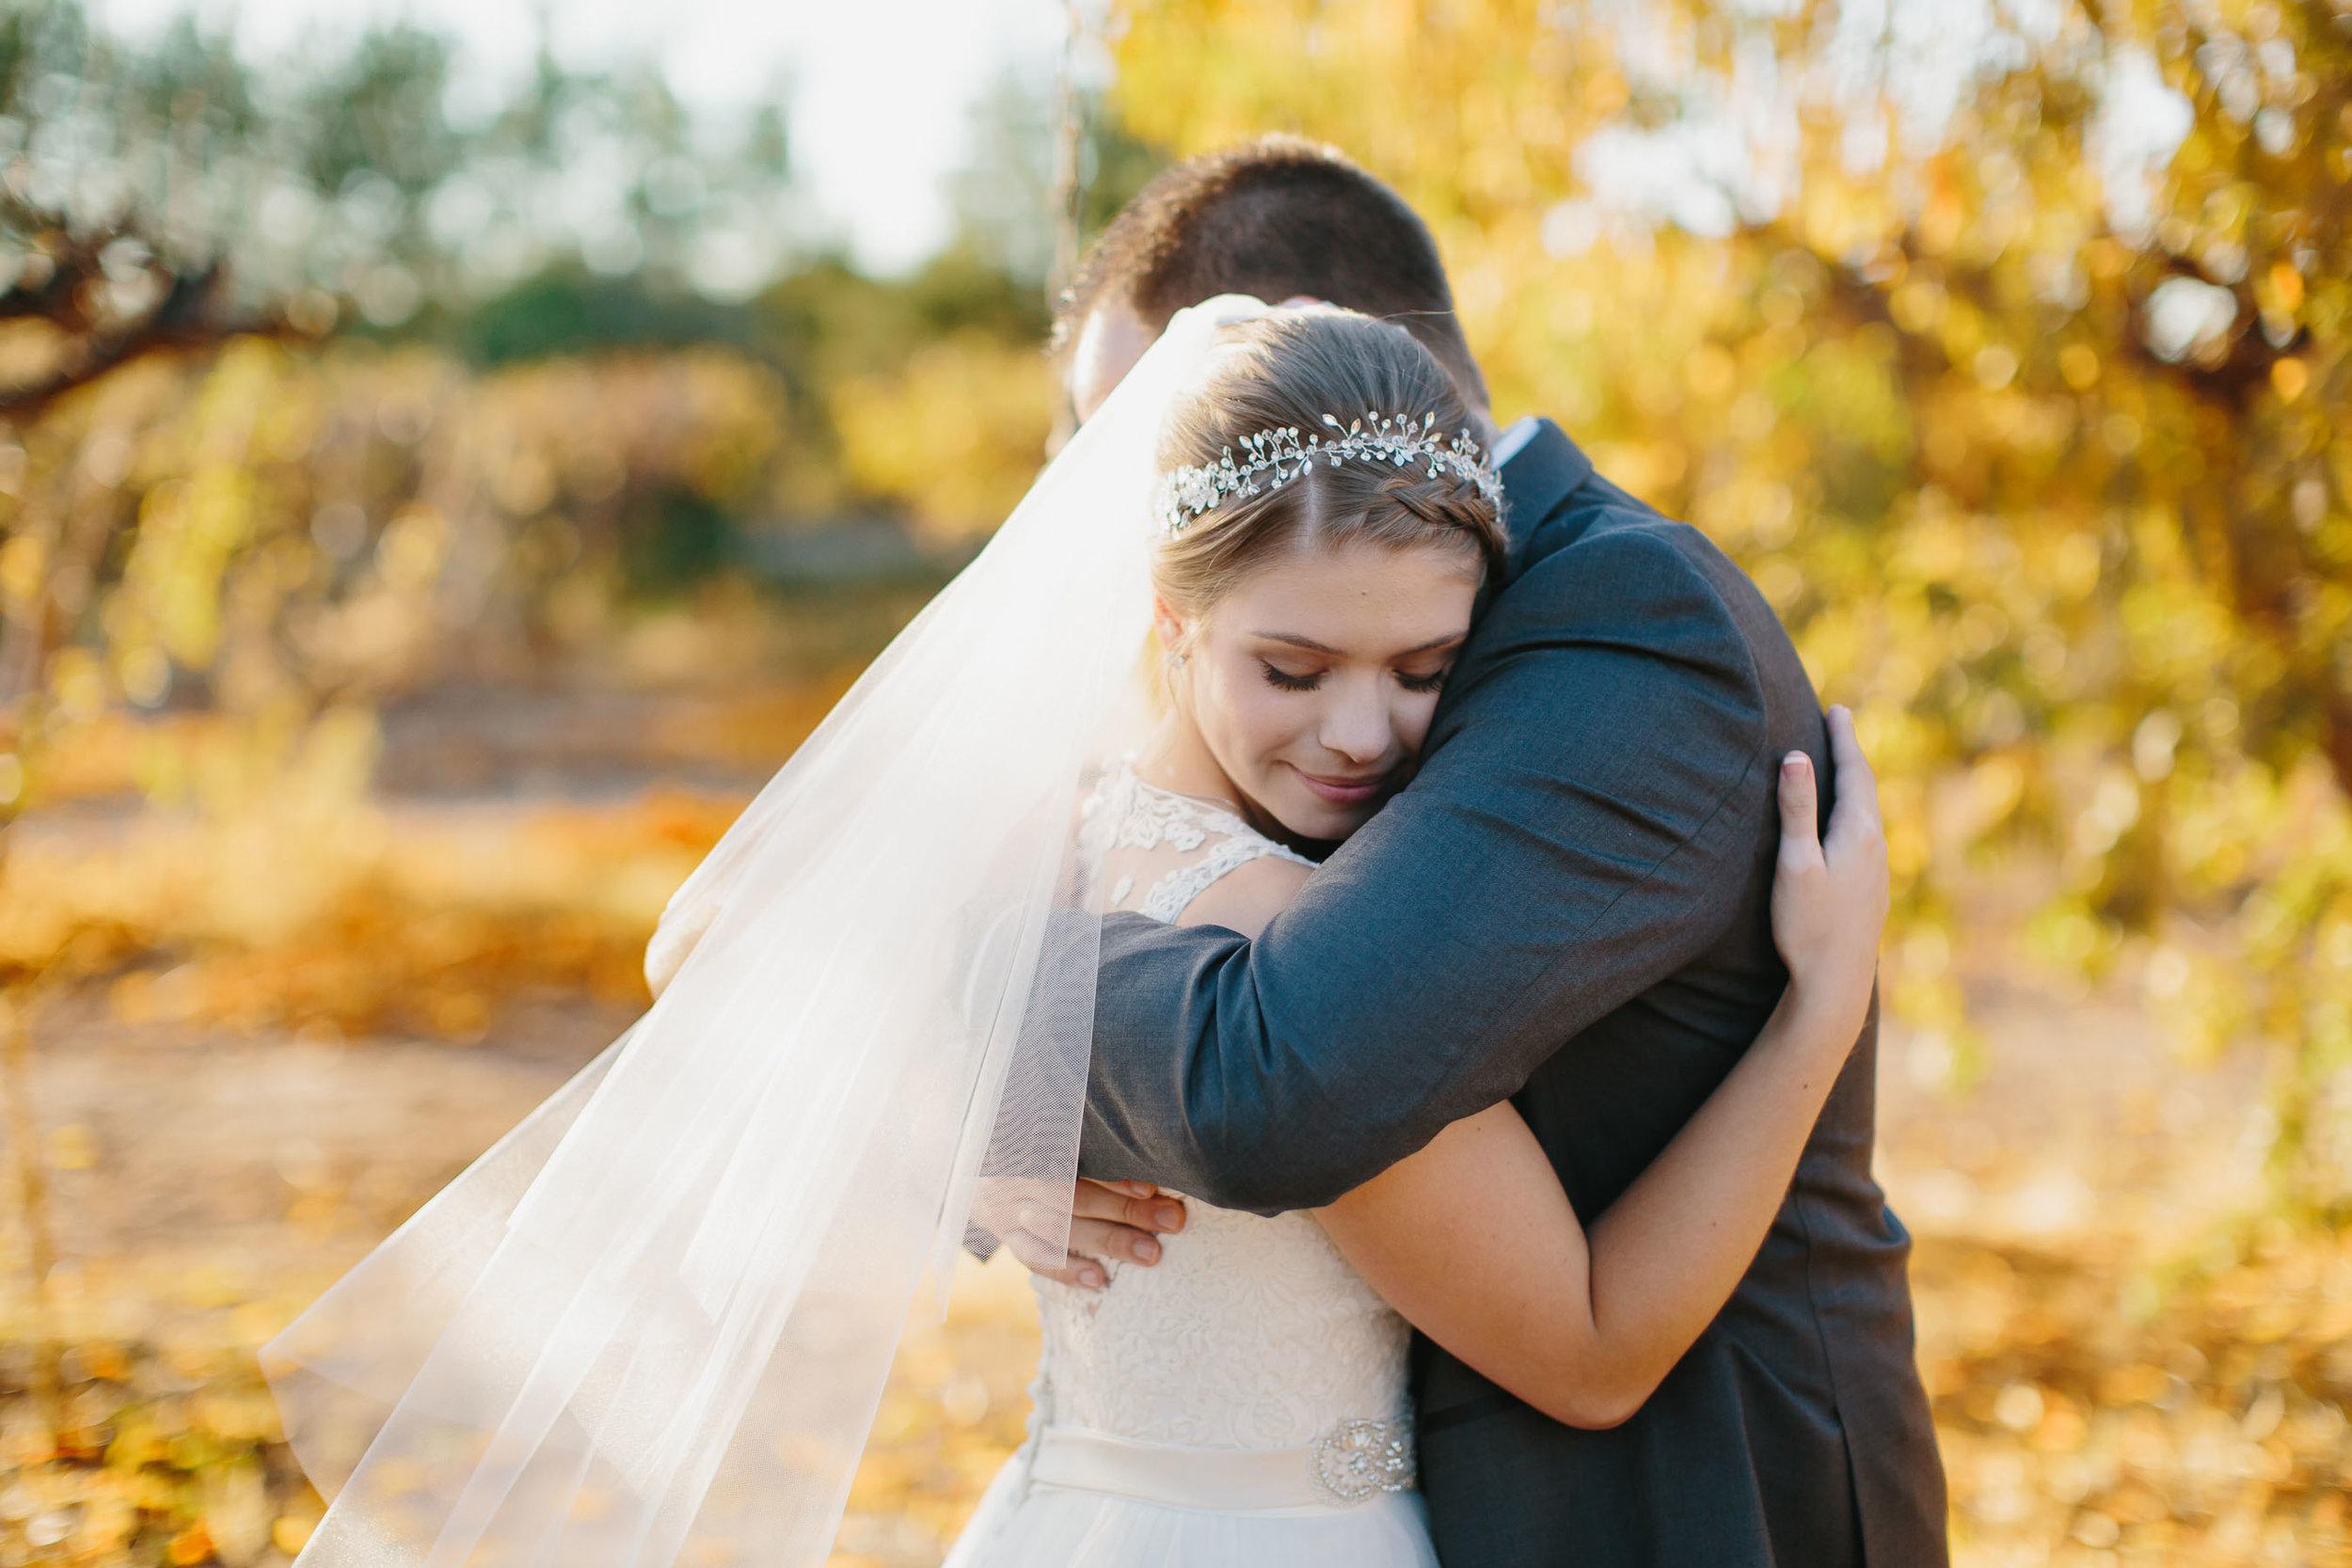 161203-Luxium-Weddings-Arizona-Gilbert-Schnepf-Farms-Squarespace-4556.jpg